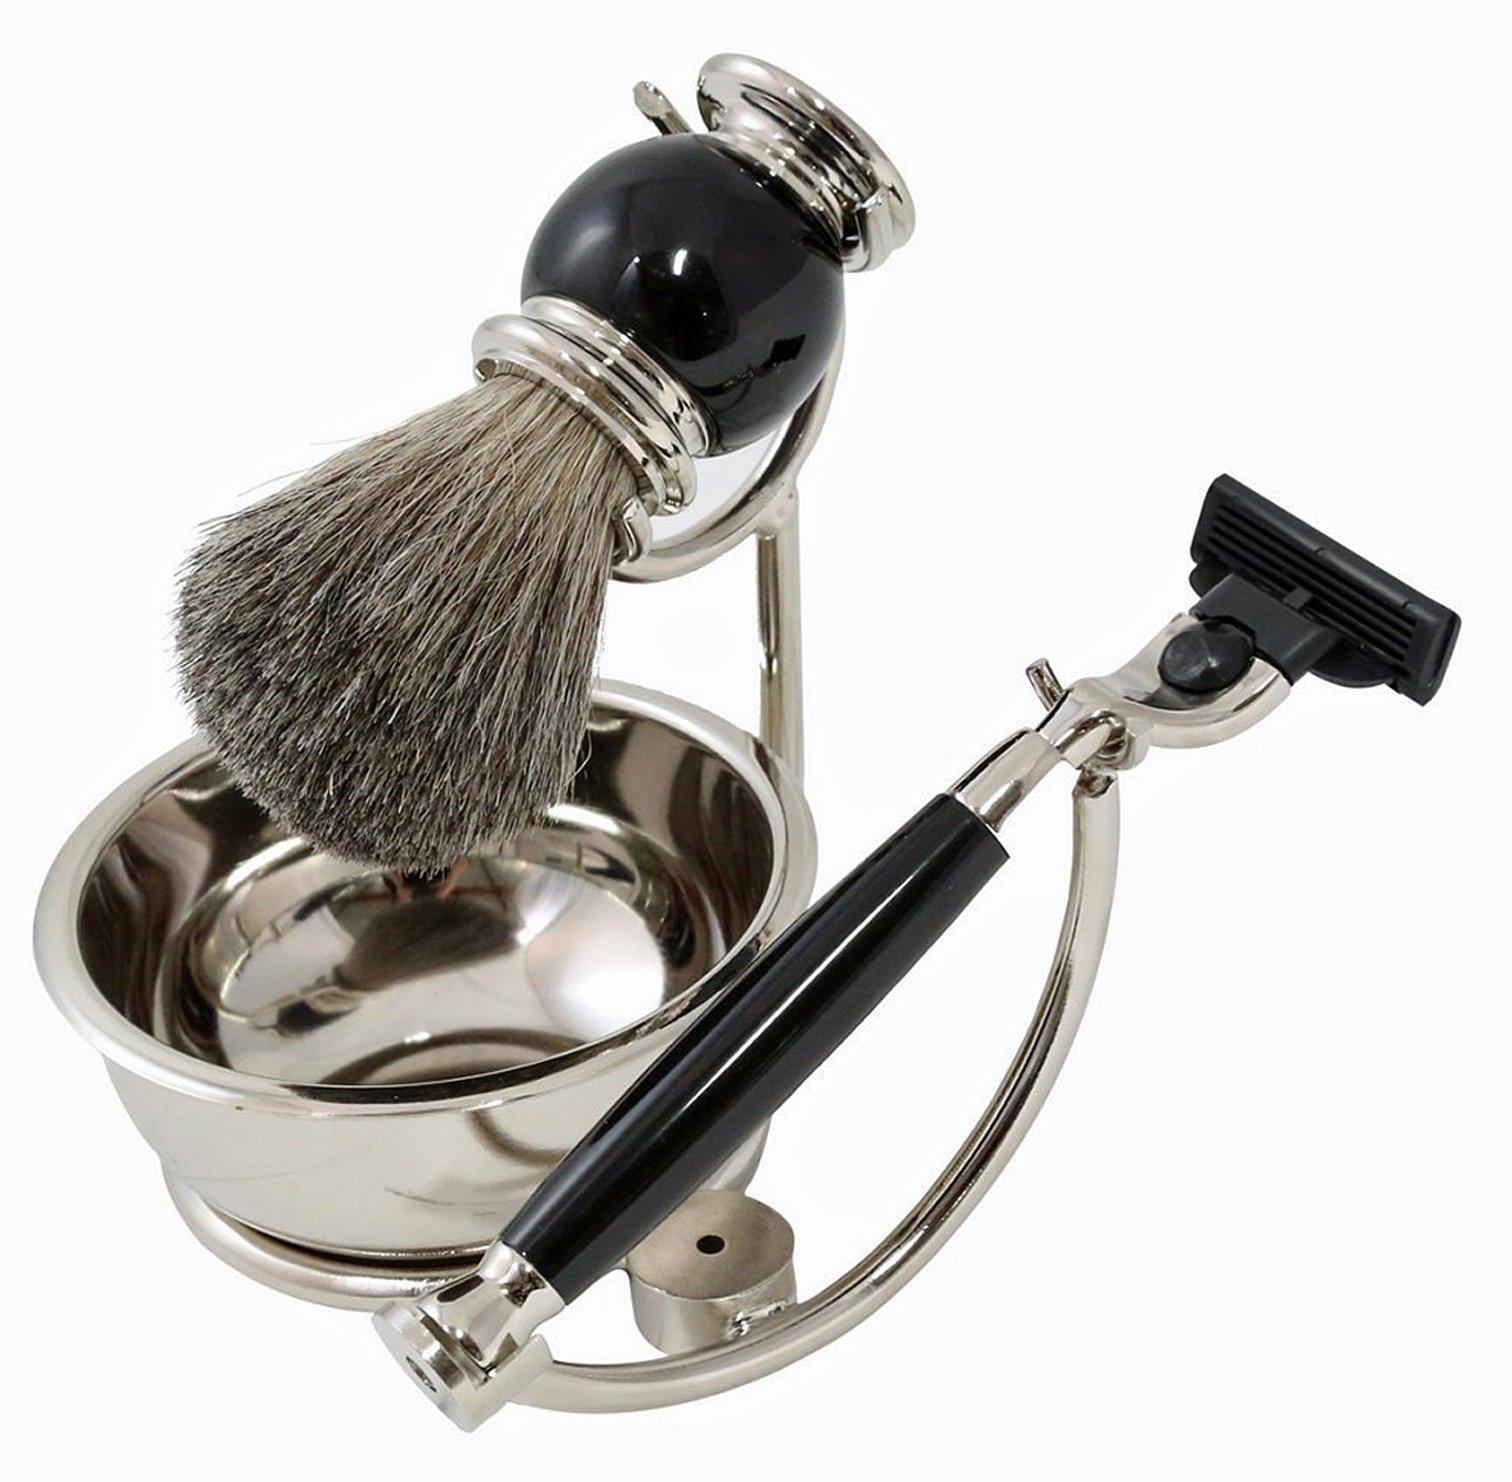 ''Bond Street'' Shaving Set - ''Mach 3'' Razor - Brush - Soap Dish - Chrome Stand - Black Enamel Accents